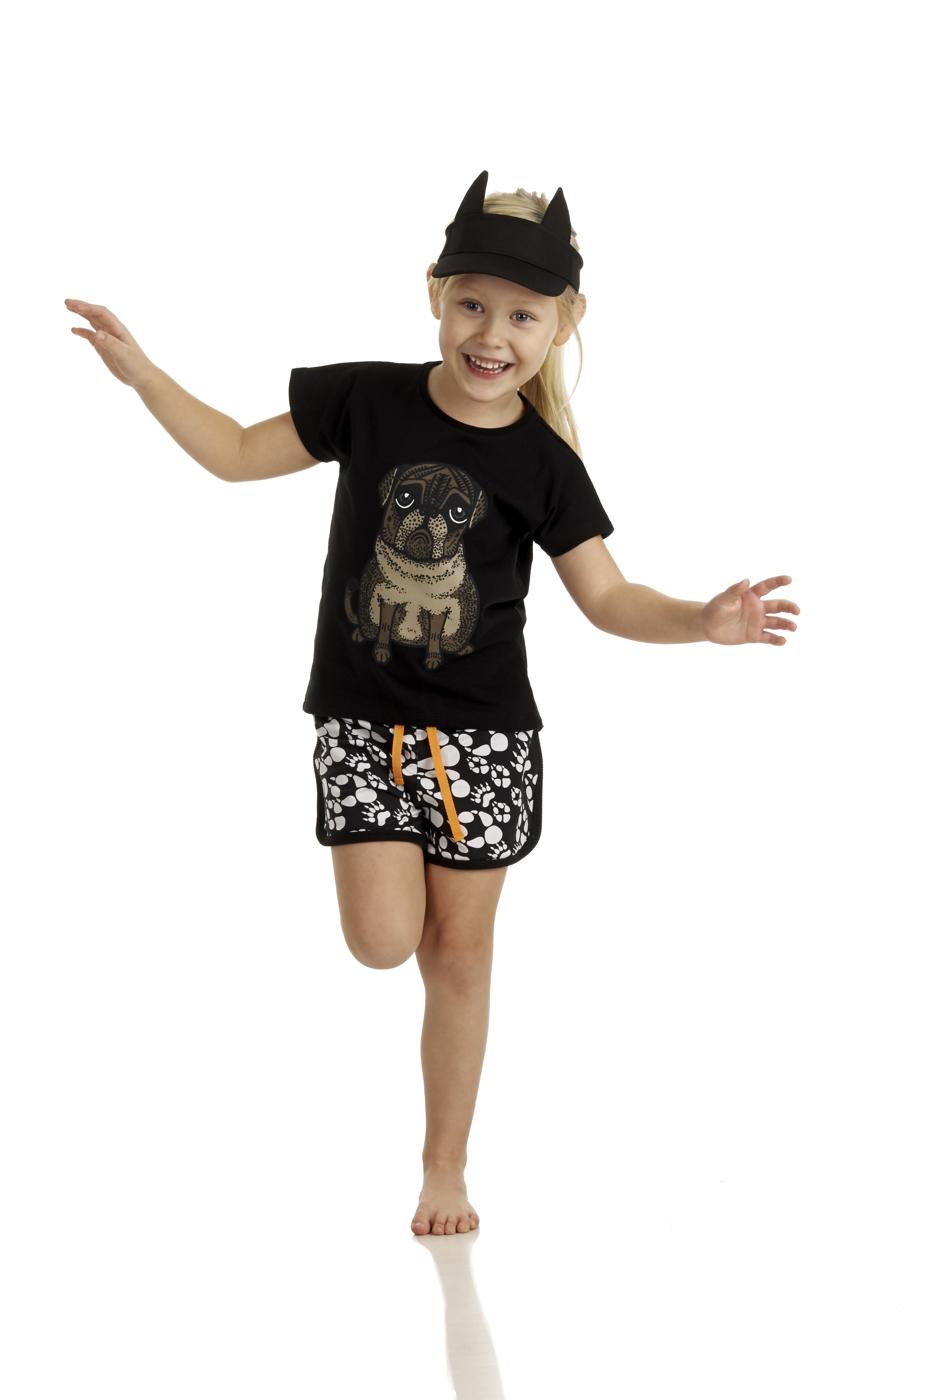 17SSTP T-shirt Pug 17SSSHP Shorts Paws AOP S